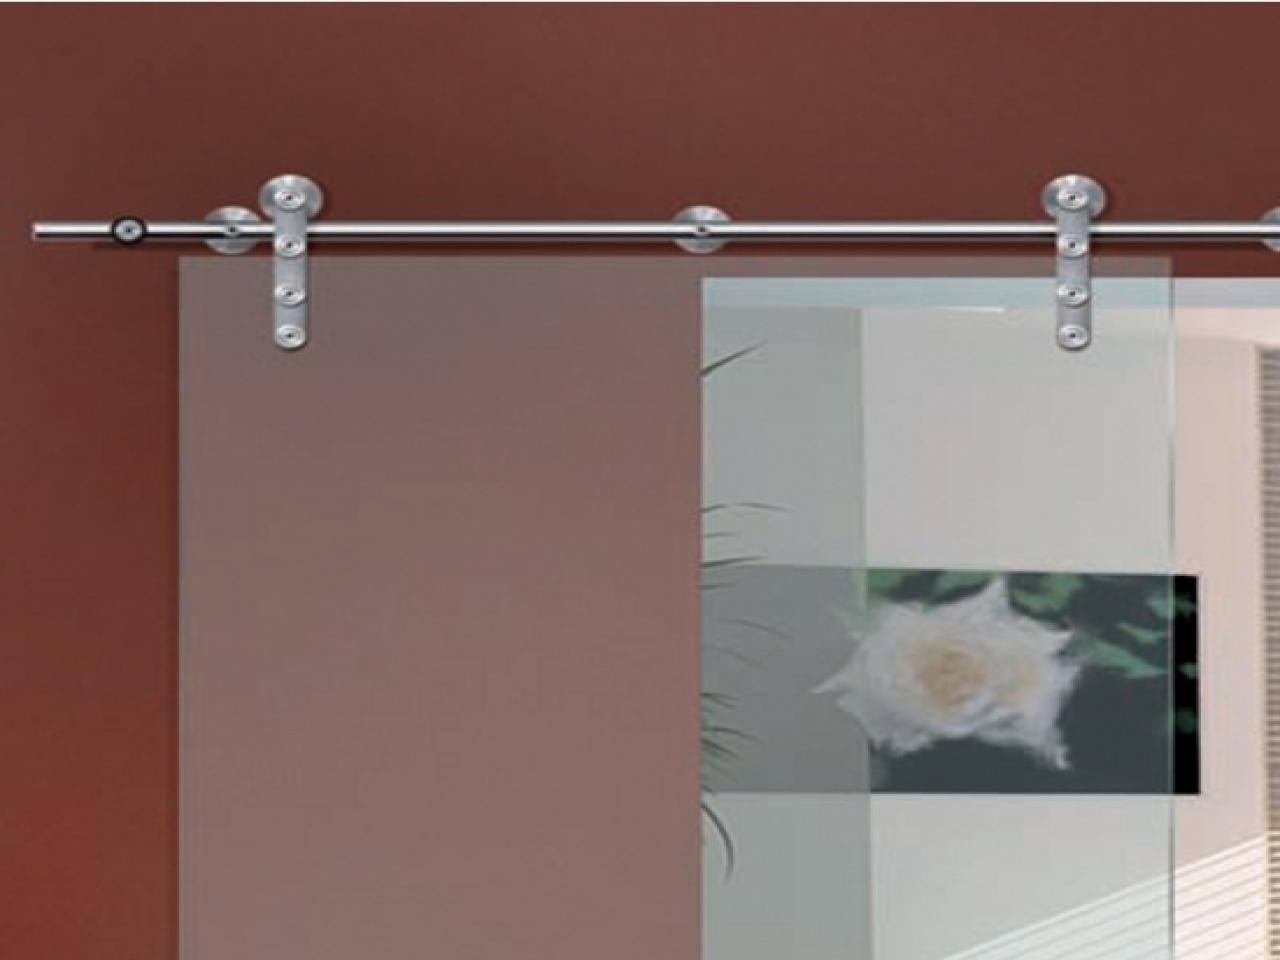 enchanting hafele glass sliding doors images exterior ideas 3d. Black Bedroom Furniture Sets. Home Design Ideas